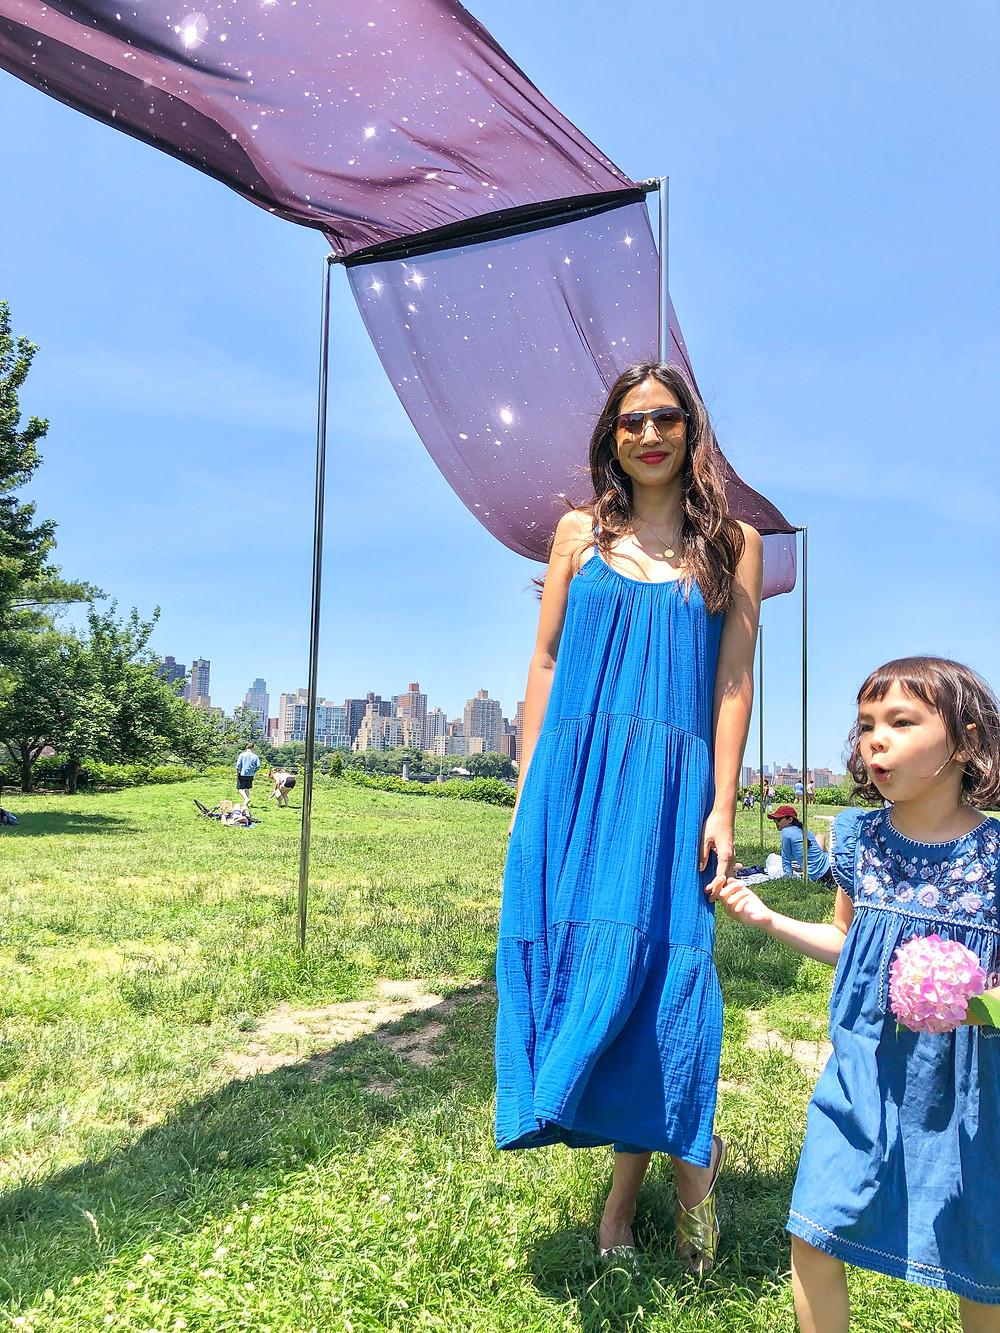 rainbow fashion, mommy and me fashion, world pride, Curious G and Me, rainbow art, rainbow art in NYC, Socrates Sculpture Park, Chronos Cosmos, Miya Ando, Ginga, Xirena Ruby dress